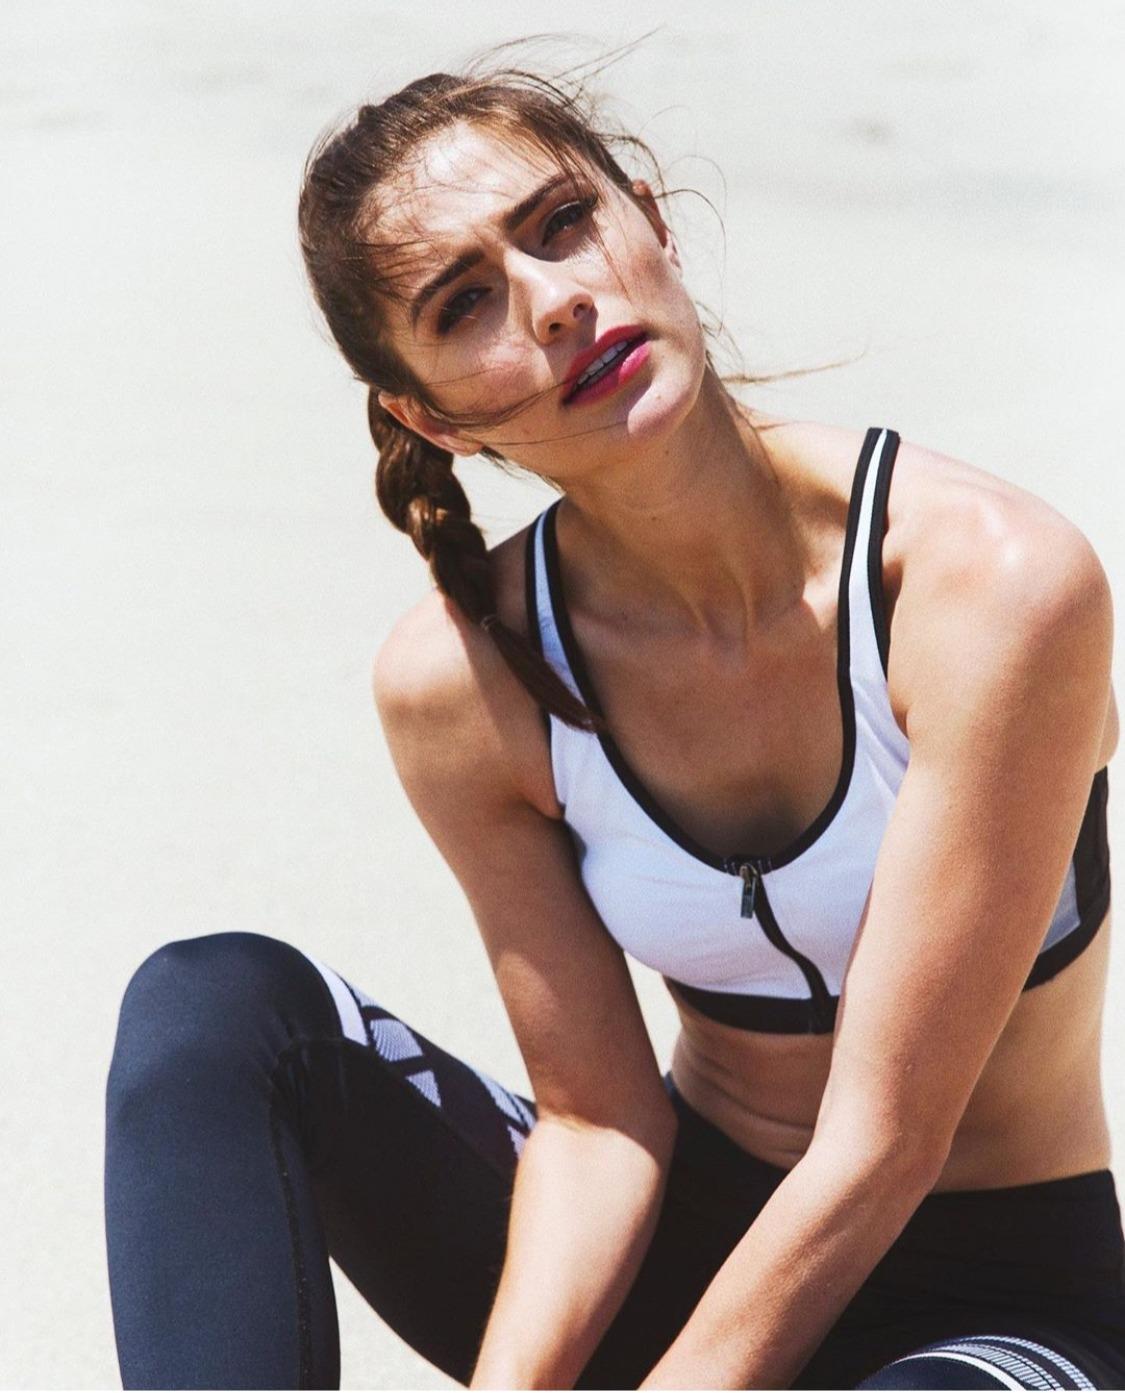 Fitness Model Beach